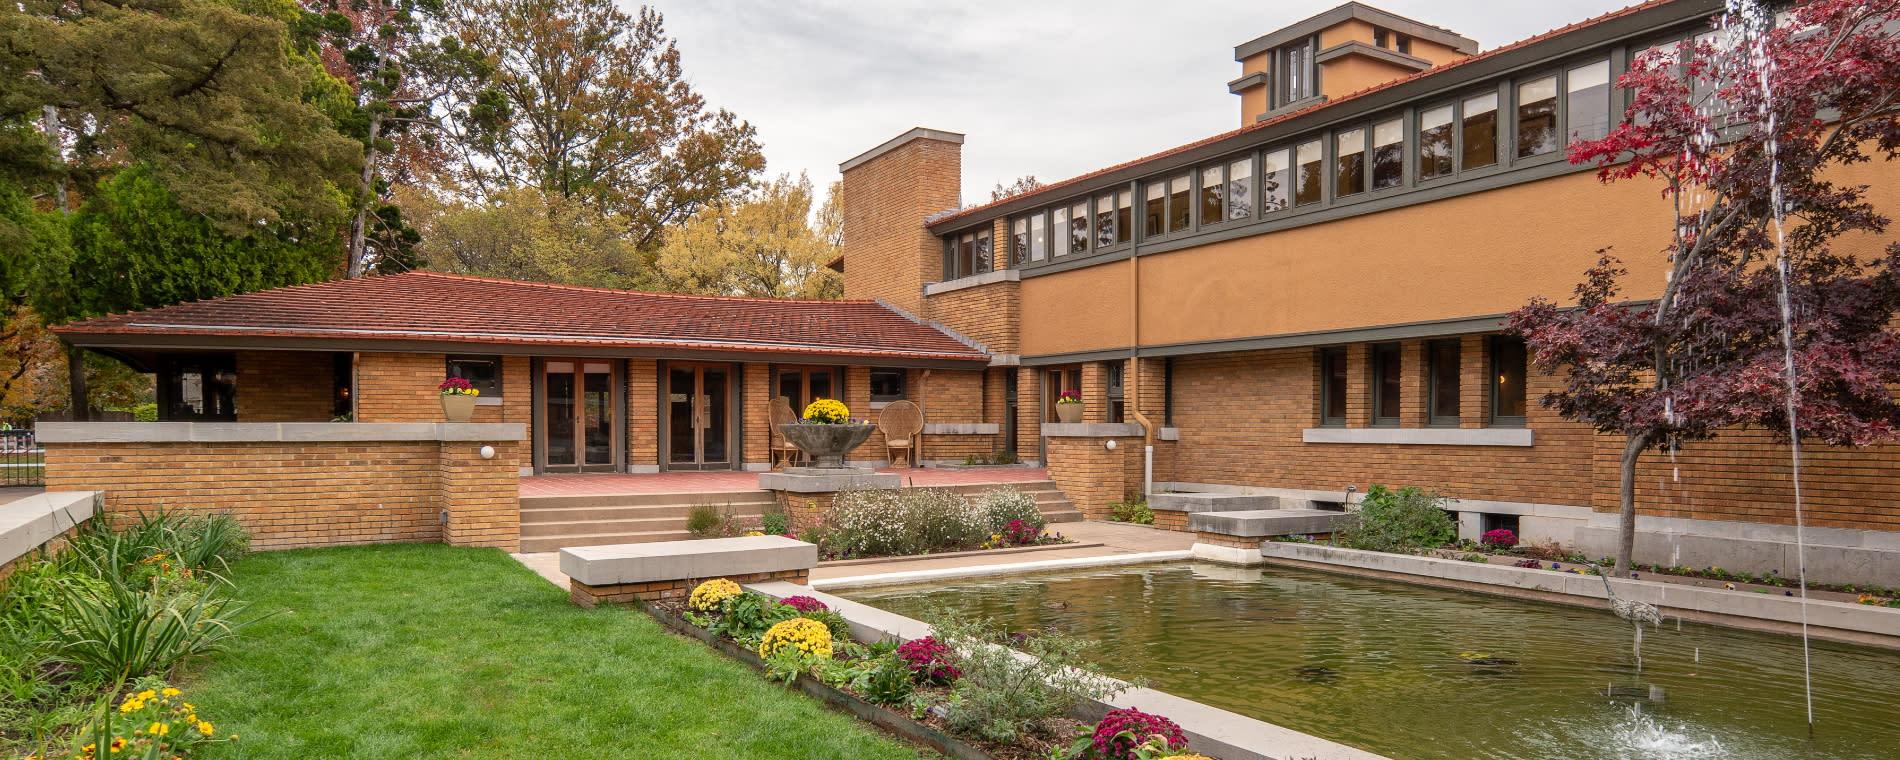 Frank Lloyd Wright's Allen House Courtyard